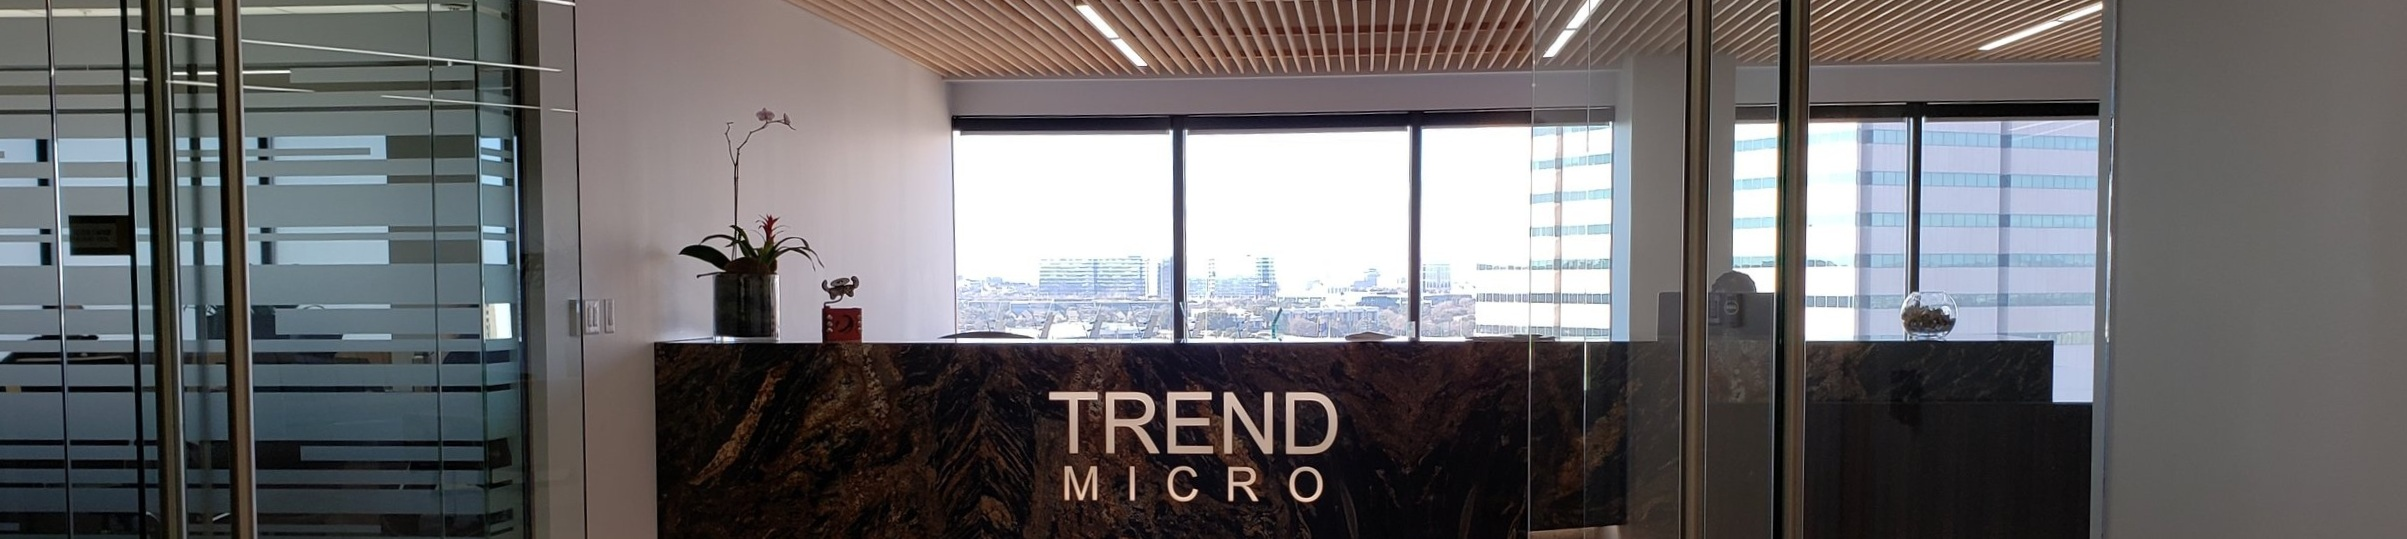 Trend-micro-office-space-belveal-art-extra-life-trophy-desk.jpg